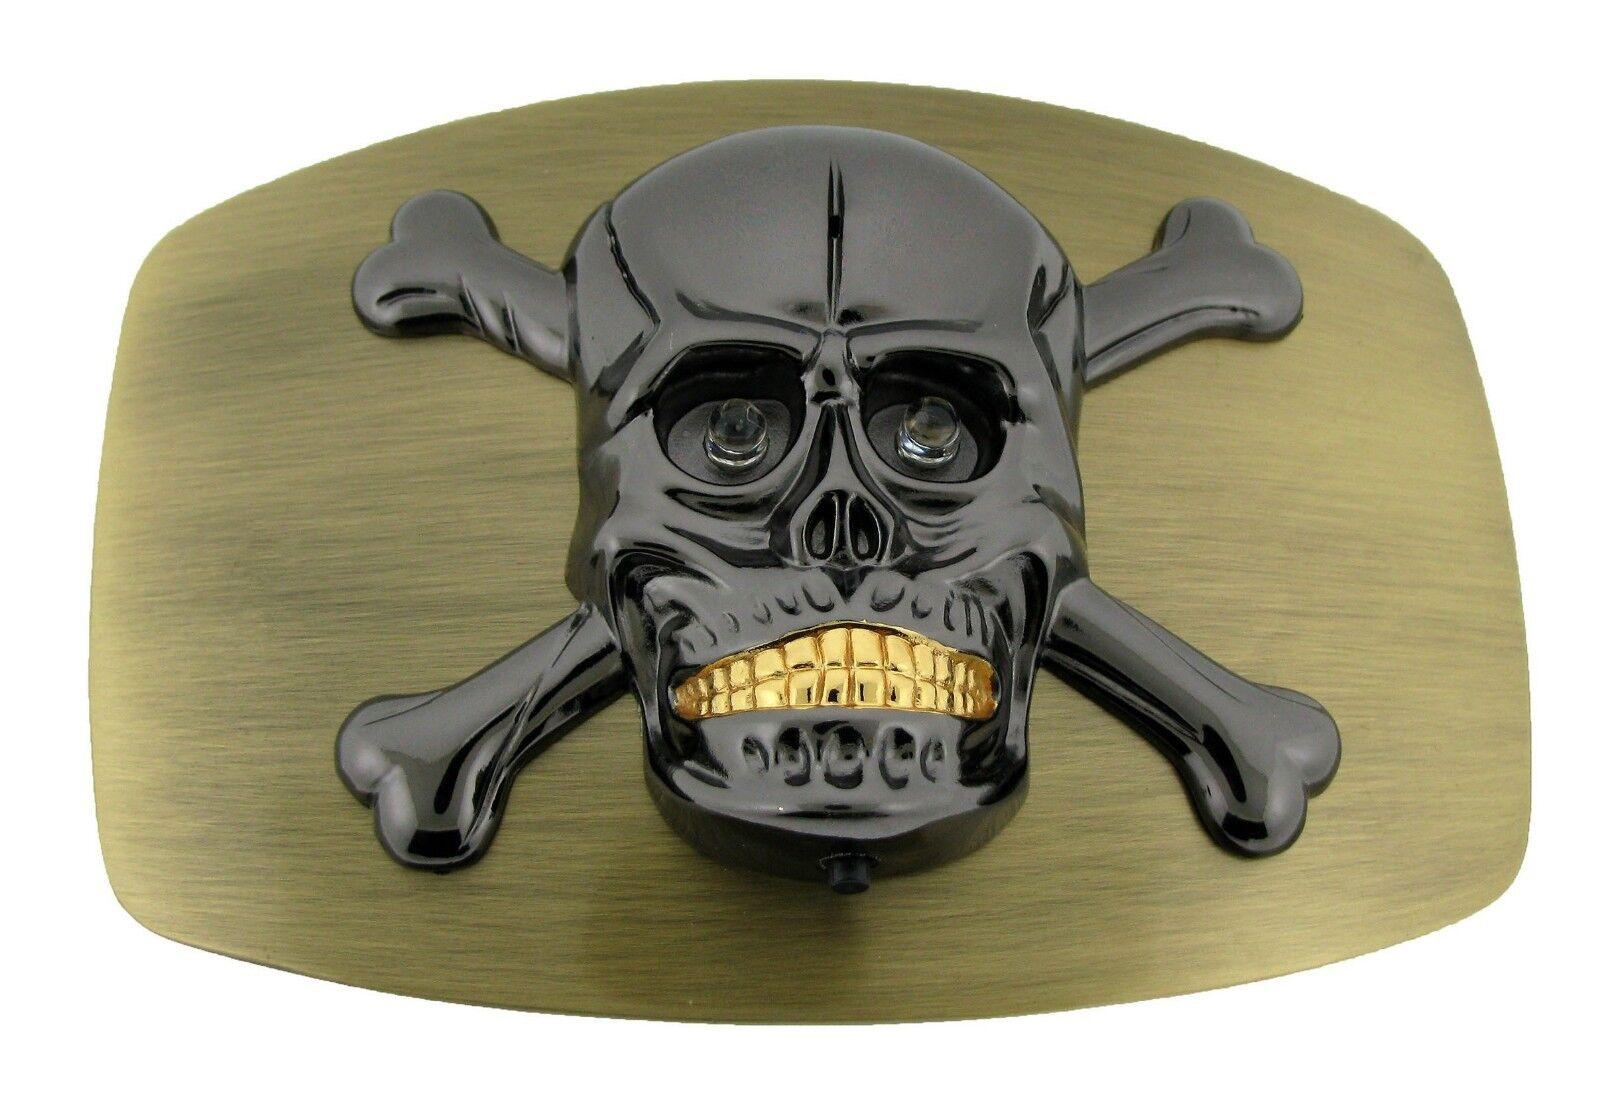 Groß Herren Totenkopf Skelett Gürtelschnalle Tattoo Gotik Damen Tribal Halloween